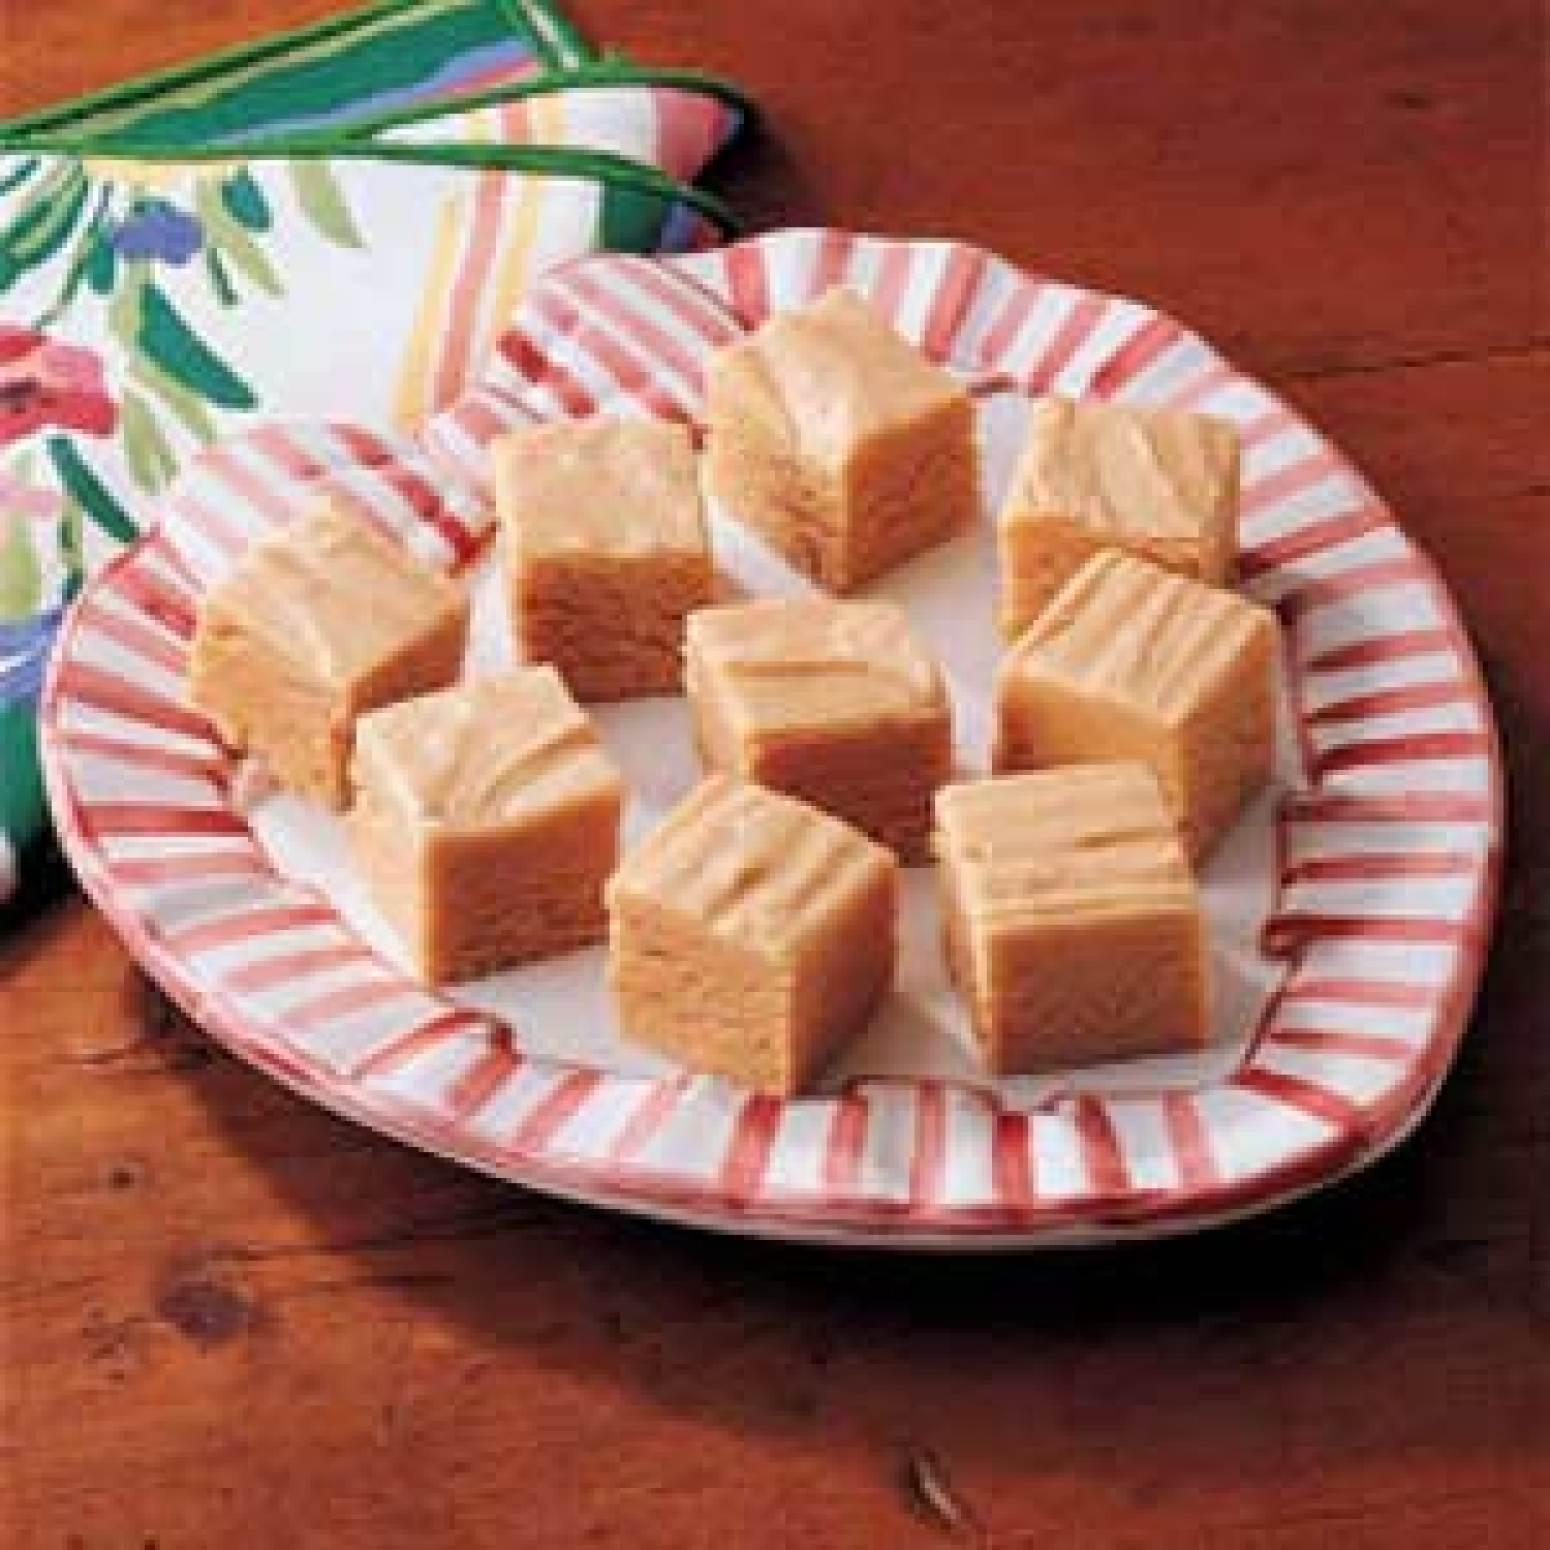 Easy Peanut Butter Fudge Recipe | Just A Pinch Recipes